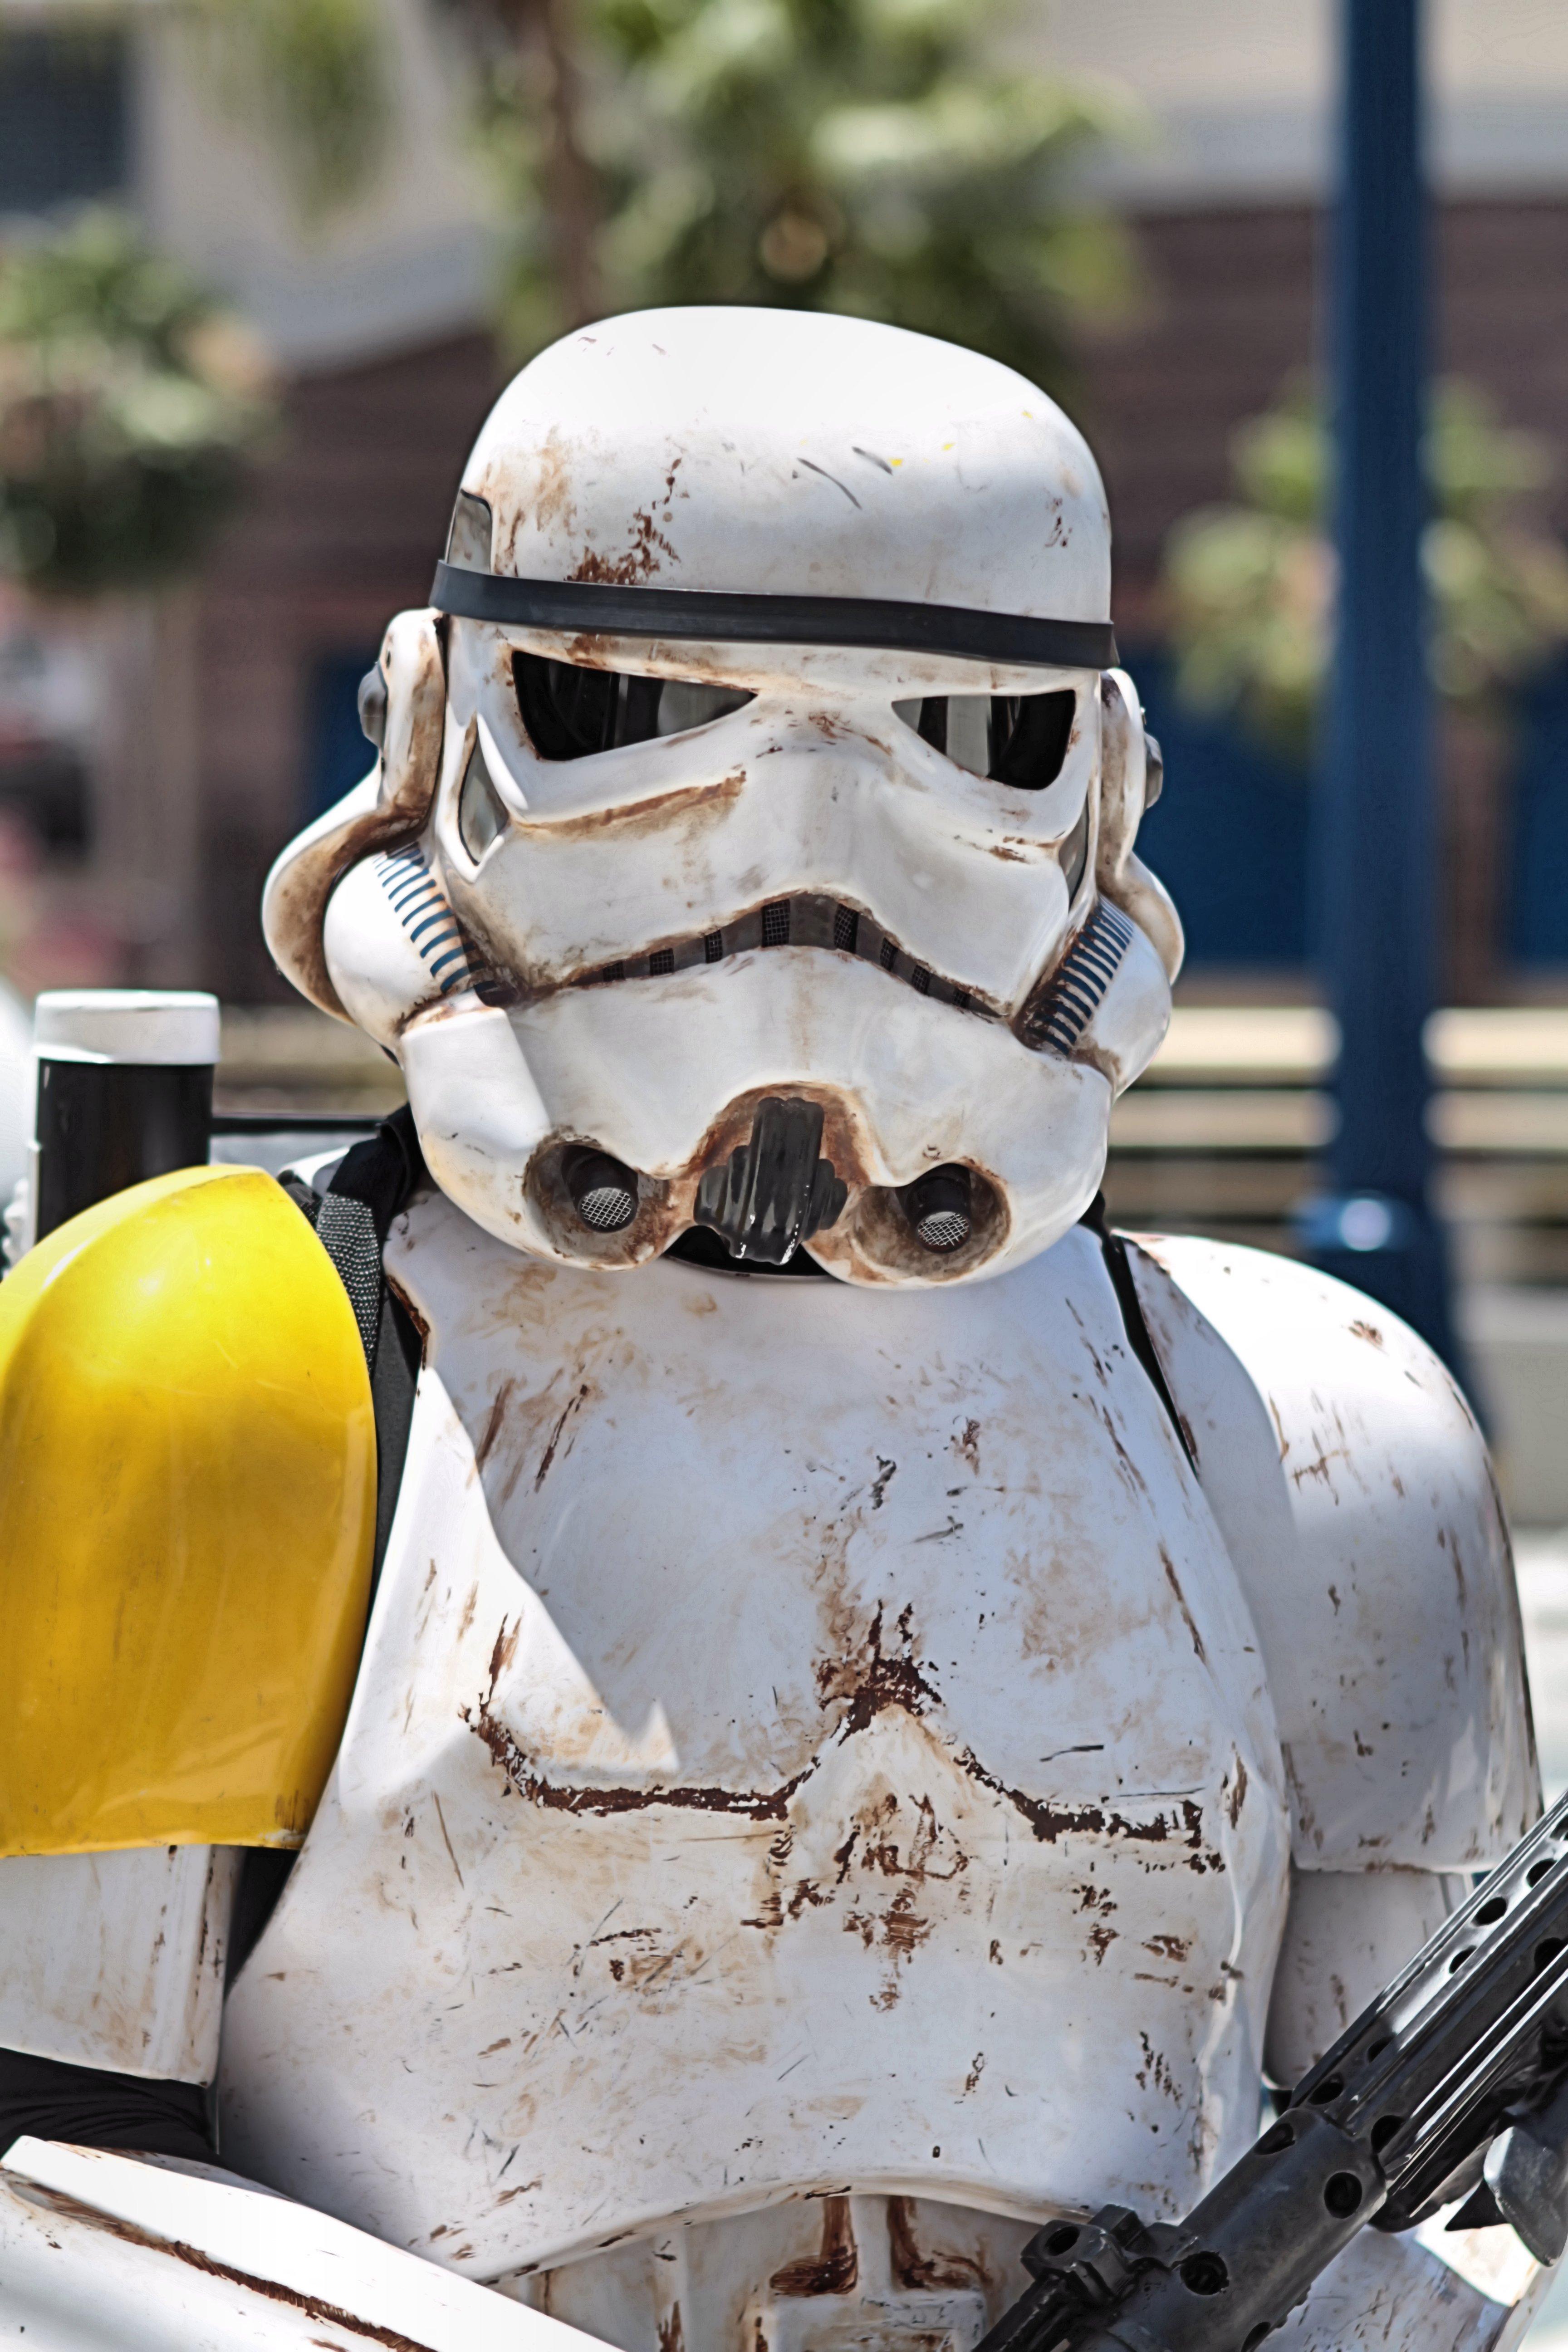 Depiction of Efecto stormtrooper